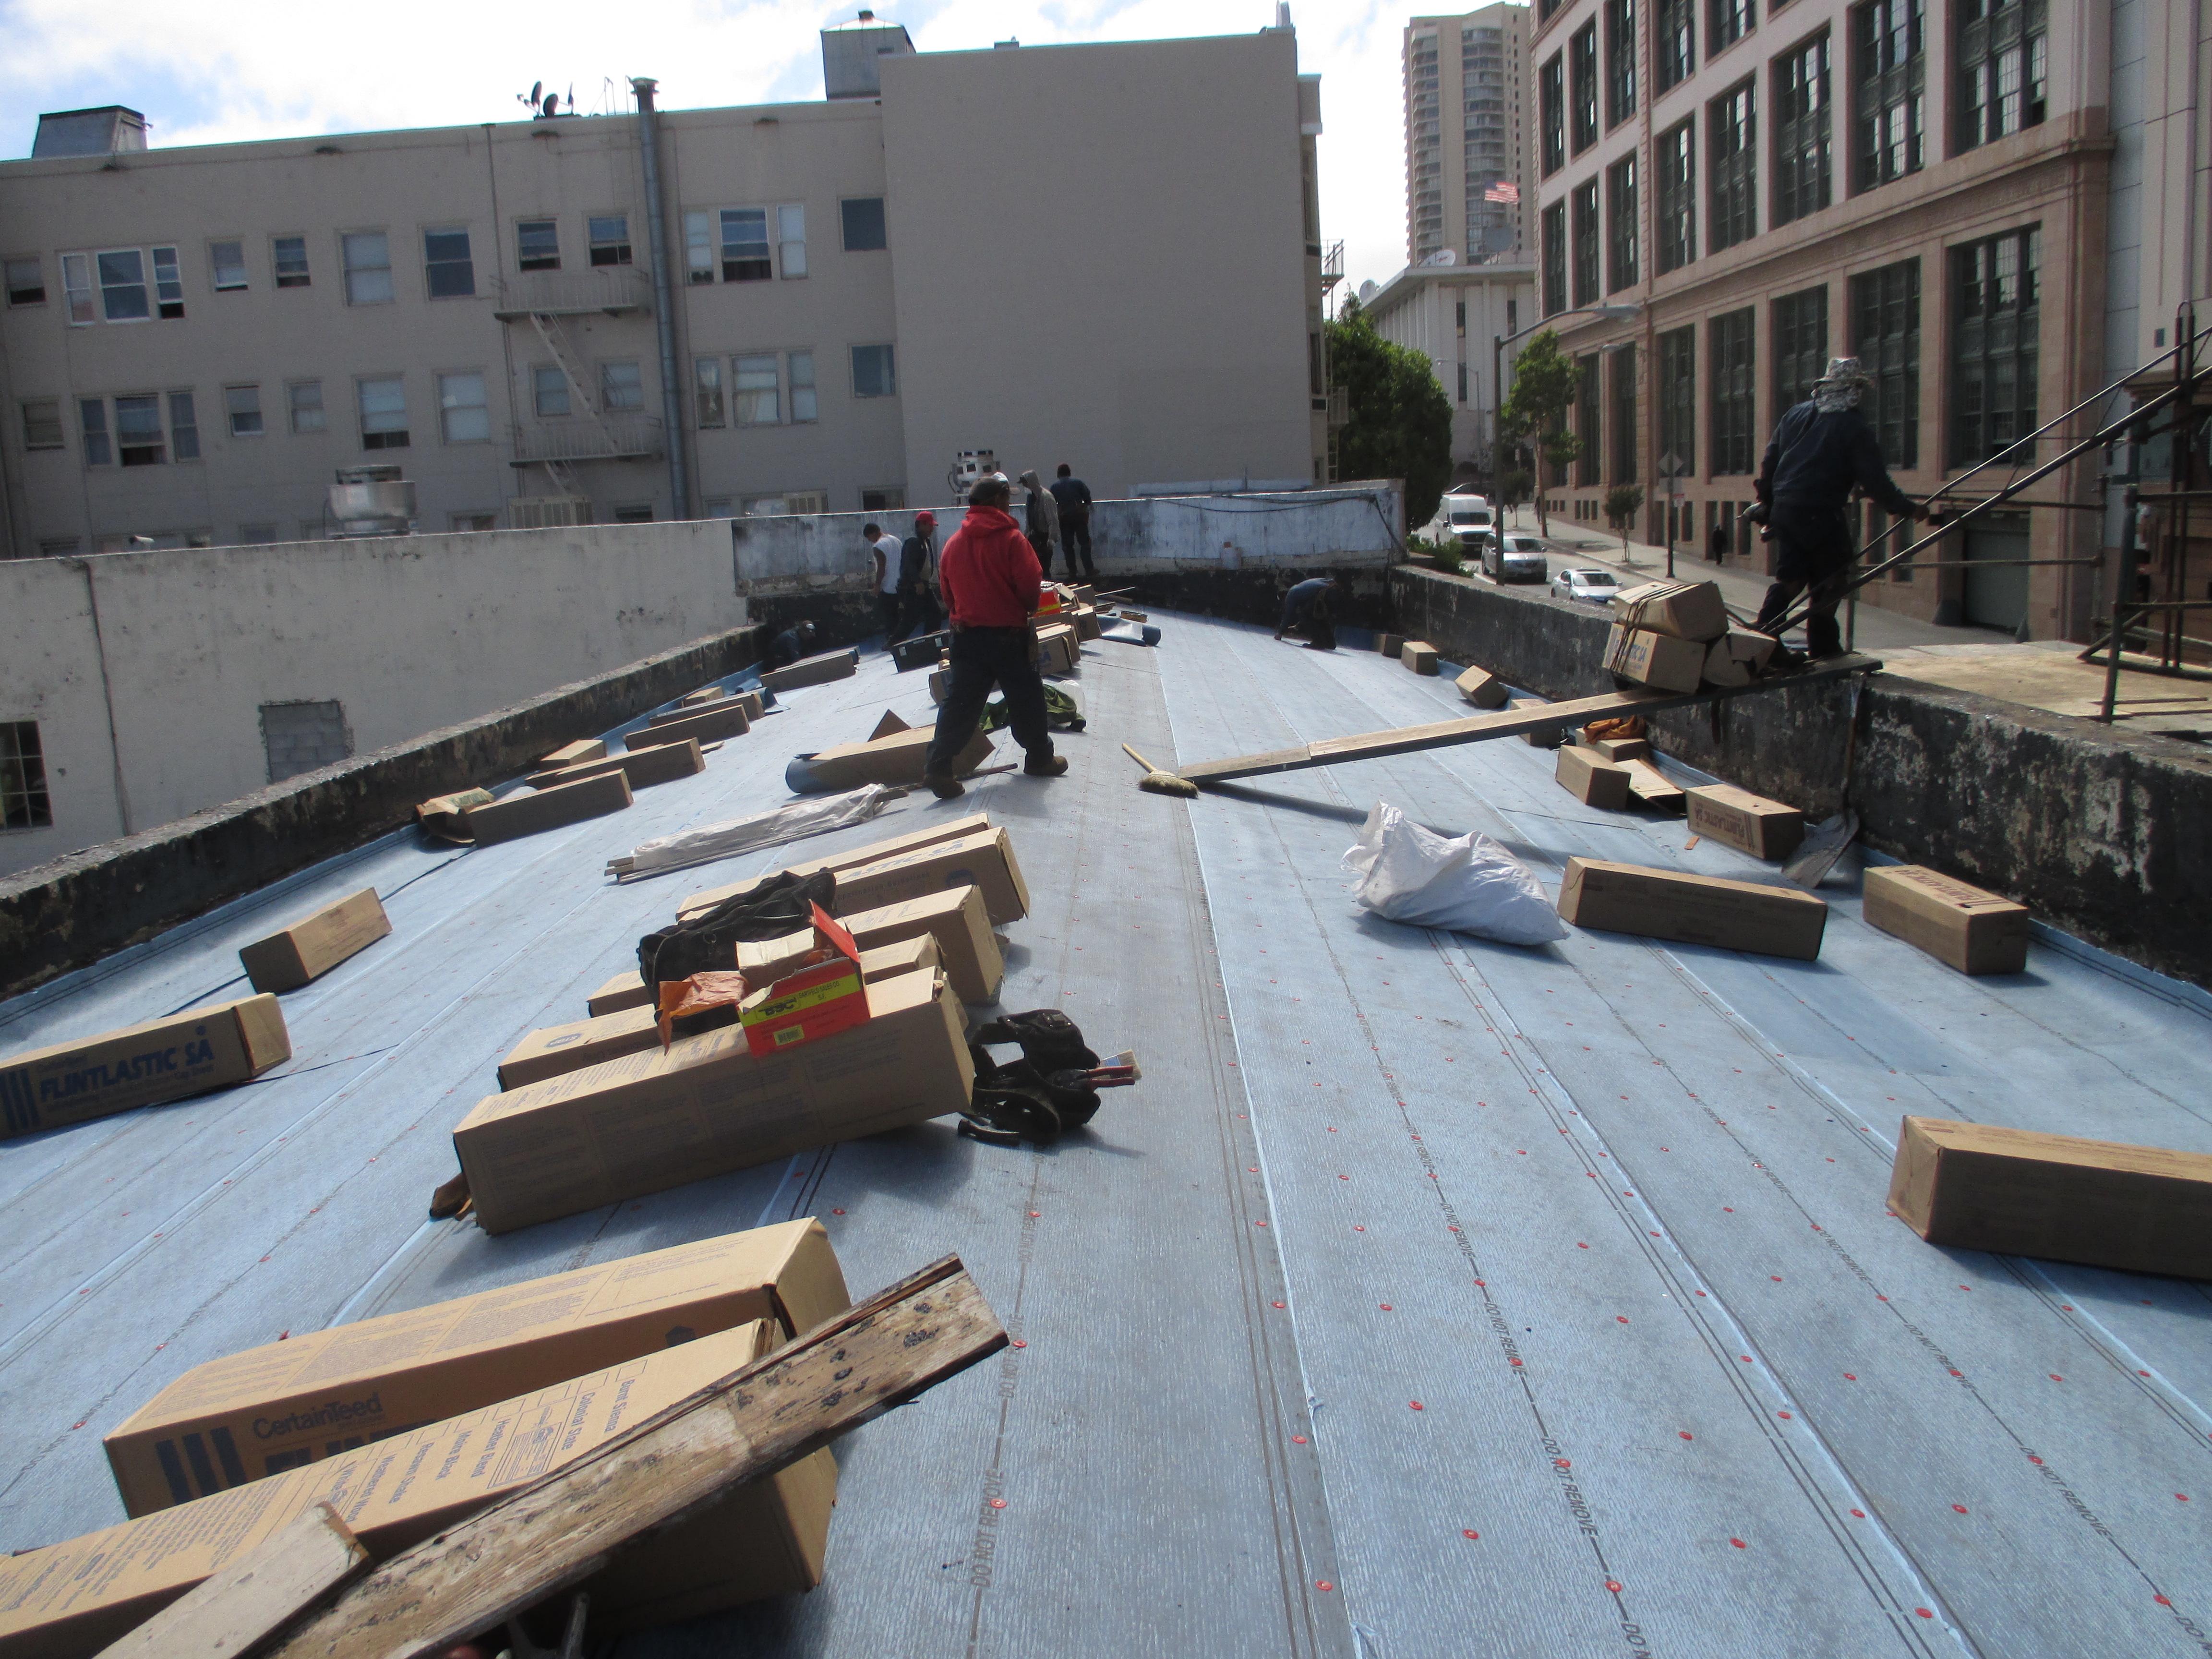 Excelsior Roofing Co. image 3